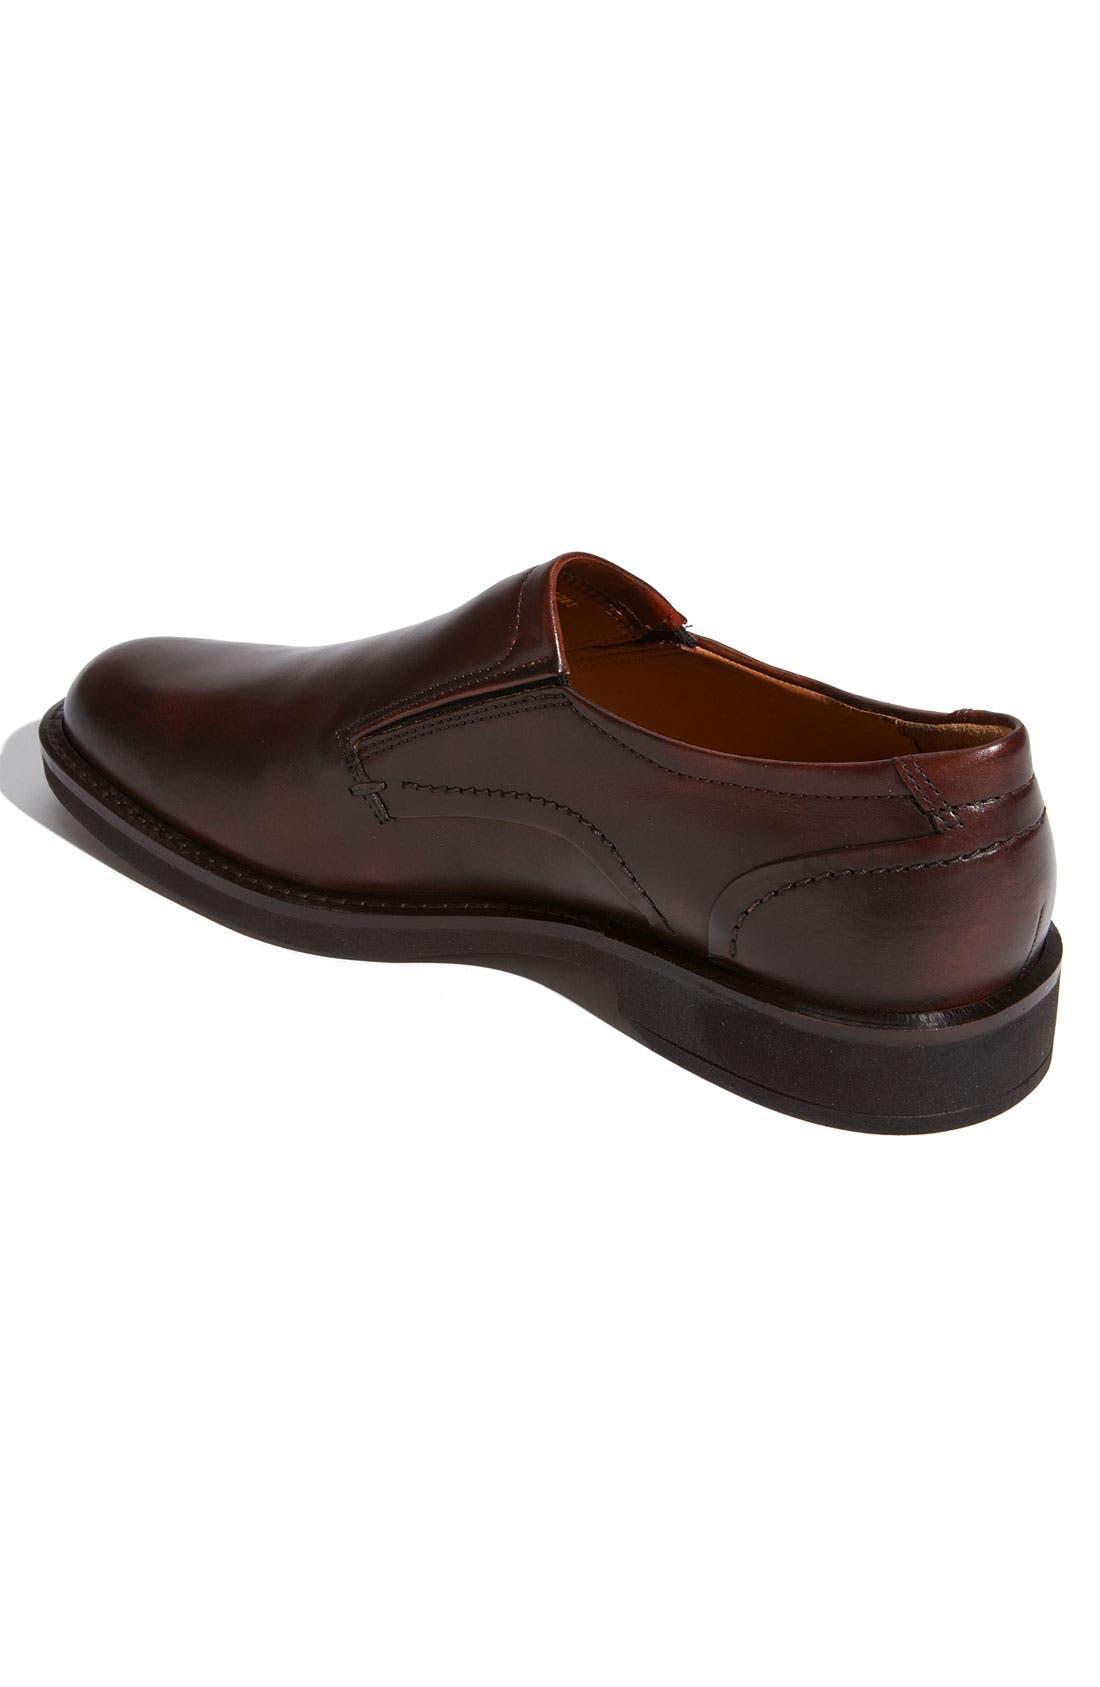 Alternate Image 2  - ECCO 'Biarritz' Slip-On Loafer